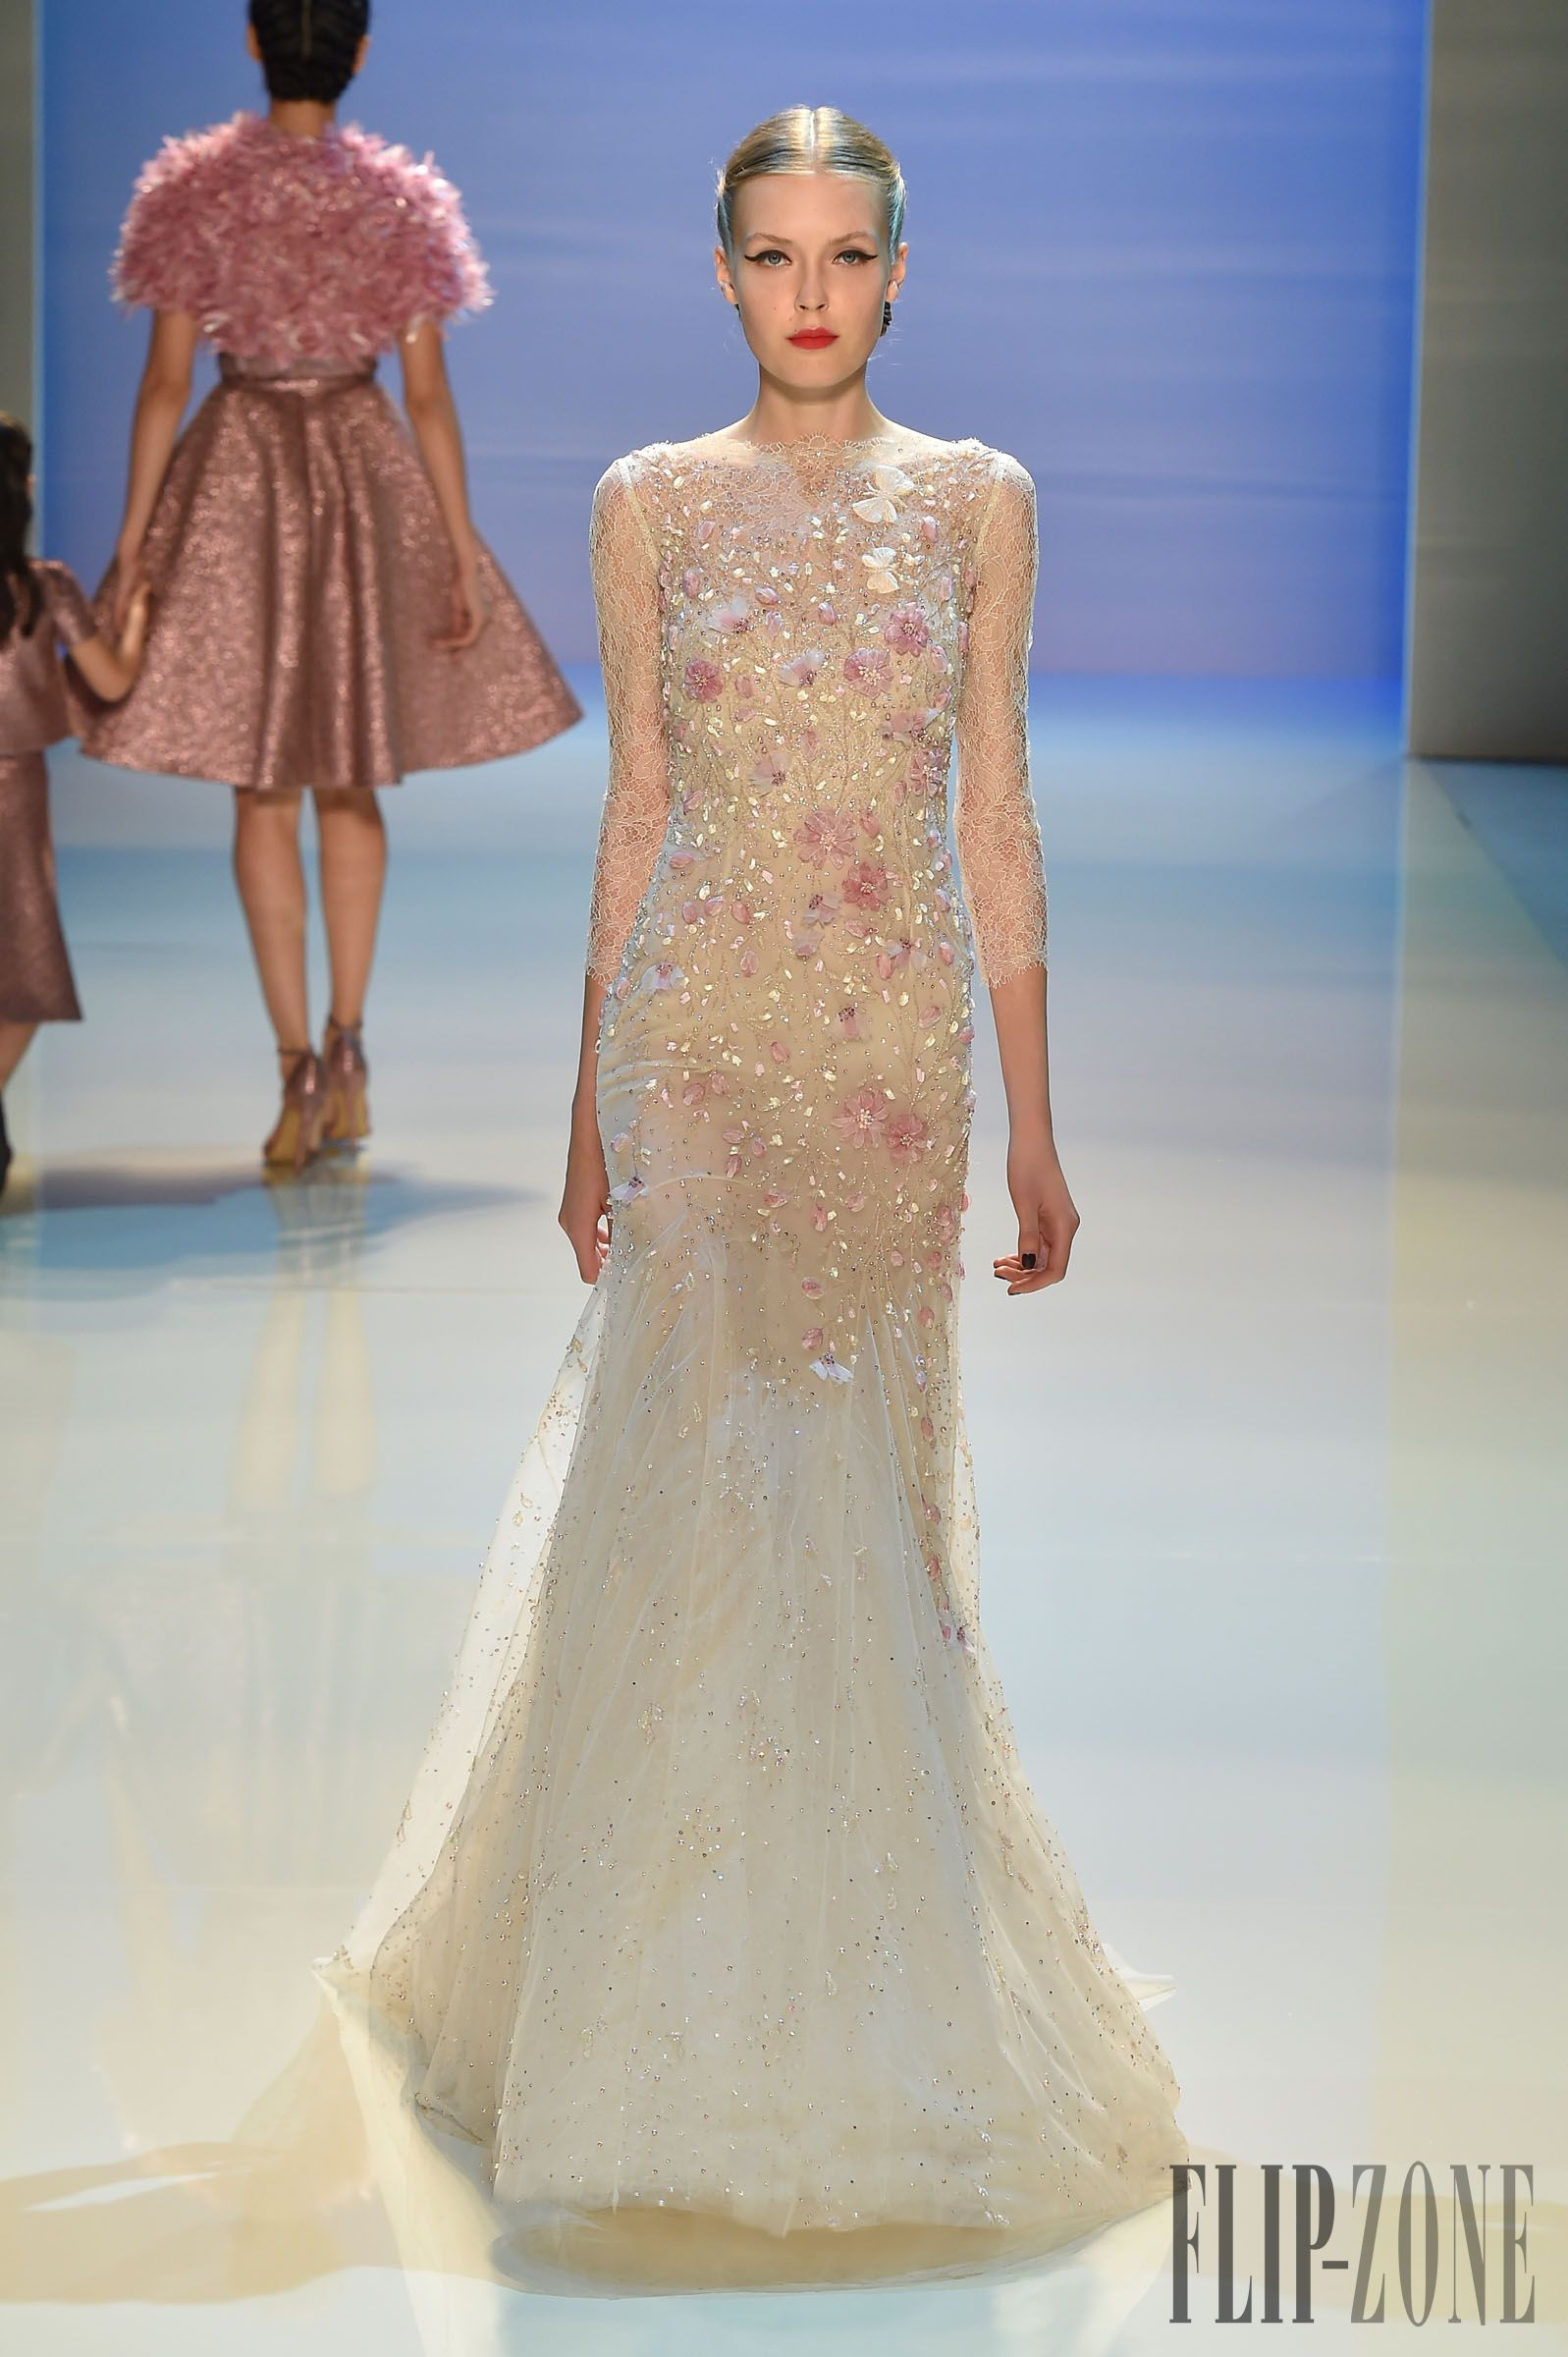 Georges Hobeika Photos officielles A-H 2014-2015 - Haute couture - http://fr.flip-zone.com/fashion/couture-1/fashion-houses/georges-hobeika-5253